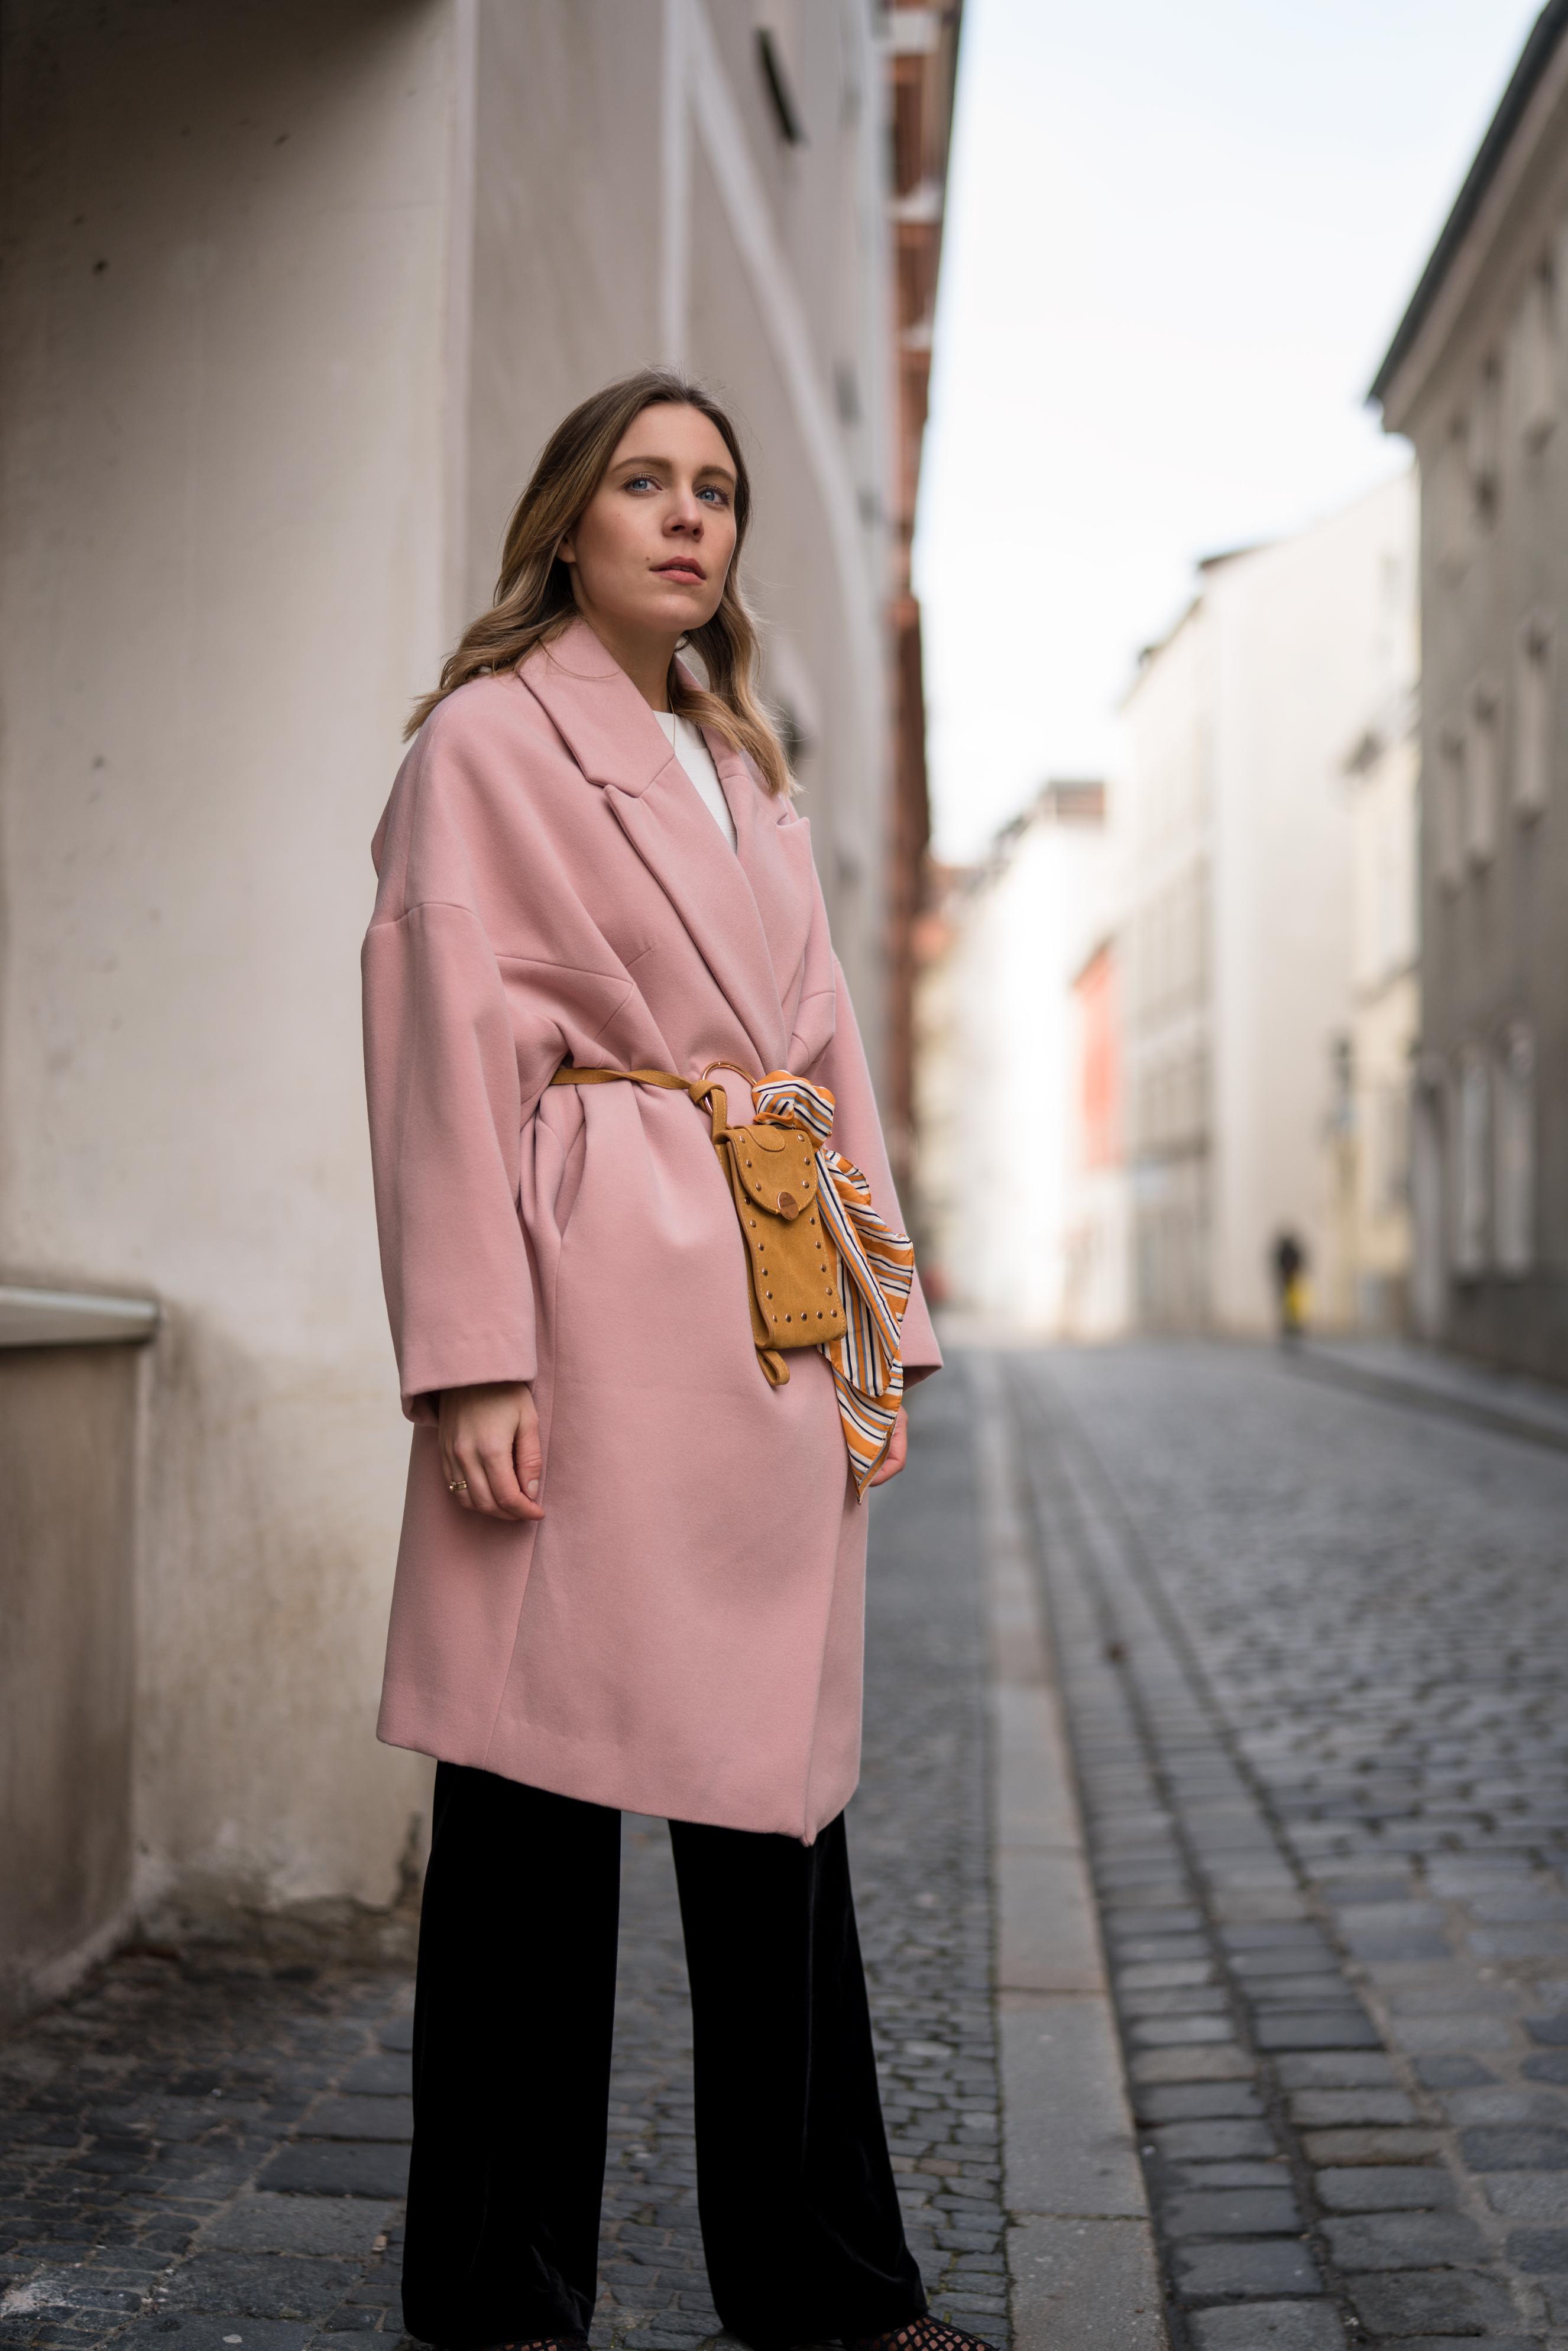 Pink Coat, Suede Belt Bag Velvet Pants rosa Mantel Seidentuch Fashion Week Berlin Jakes Samthose oversize Streetstyle Sariety Fashionblogger Modeblog Heidelberg_11